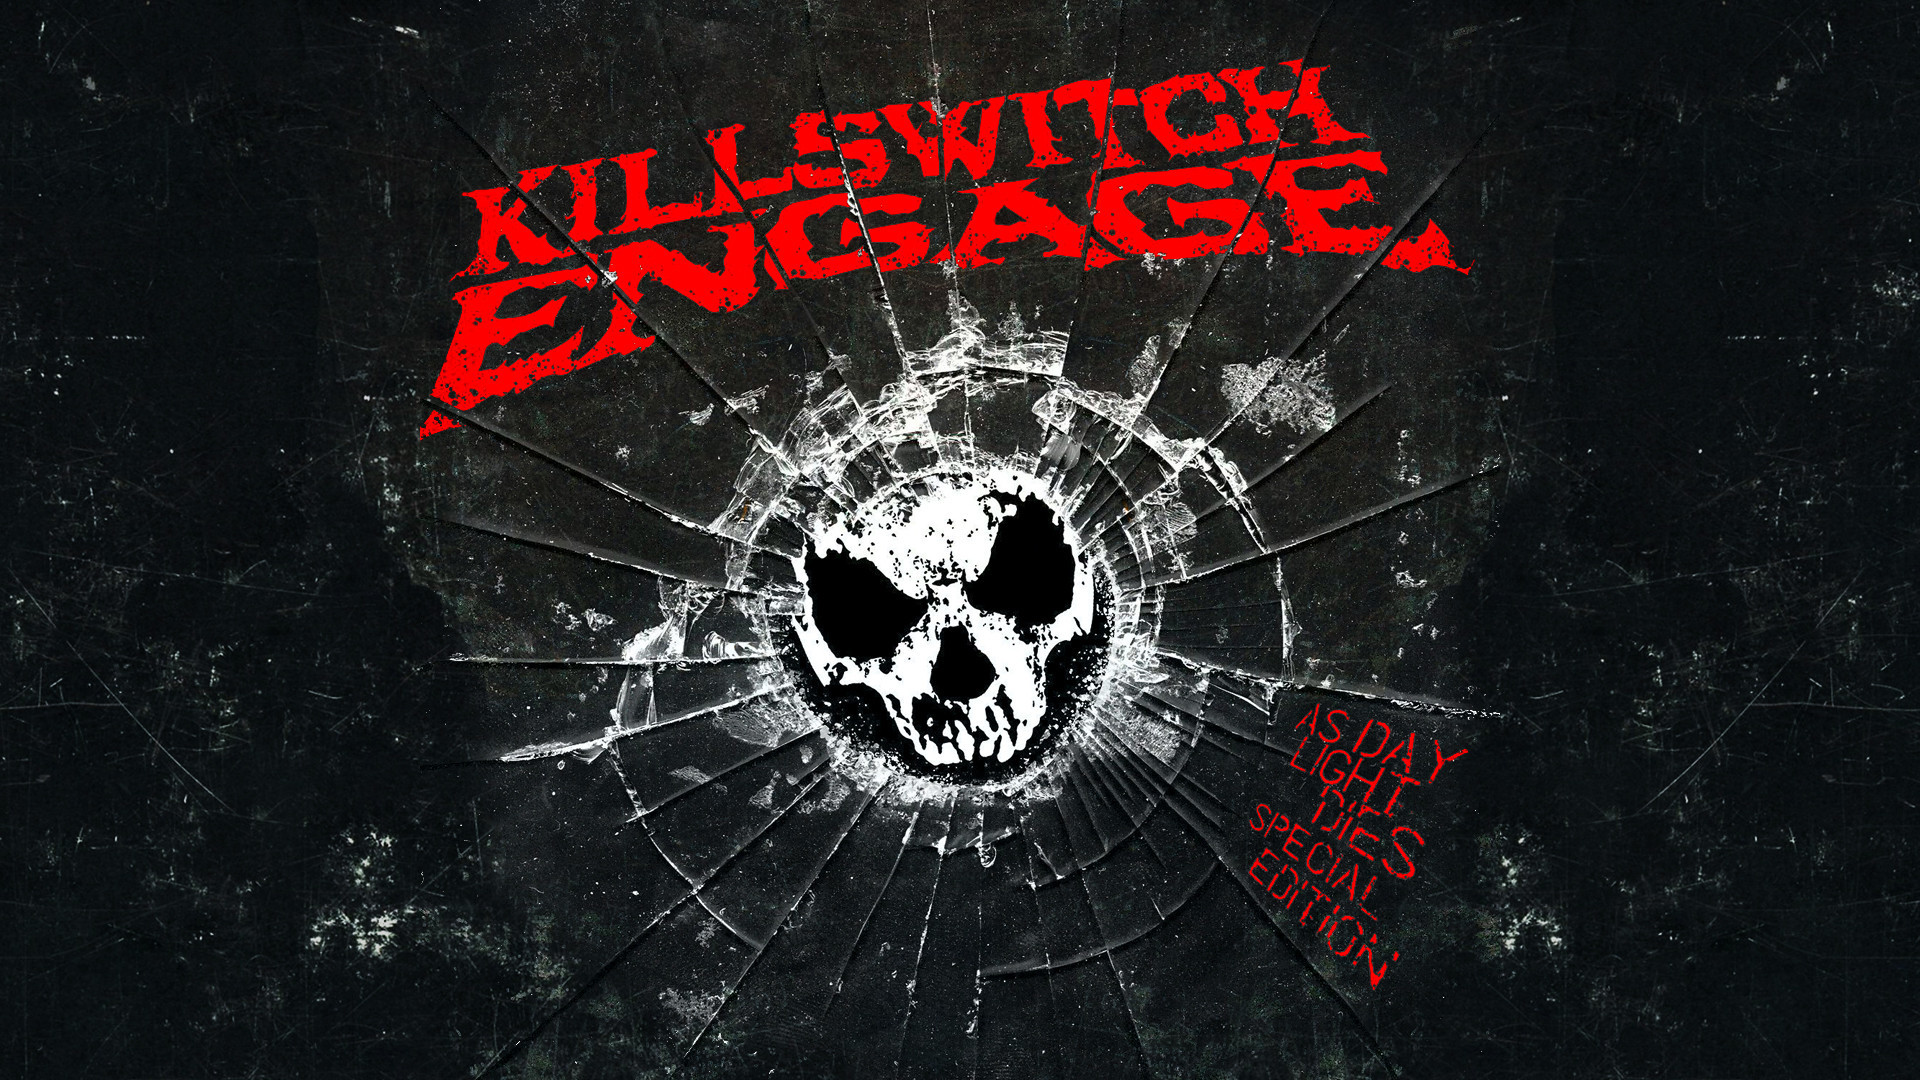 51] Killswitch Engage Wallpapers on WallpaperSafari 1920x1080